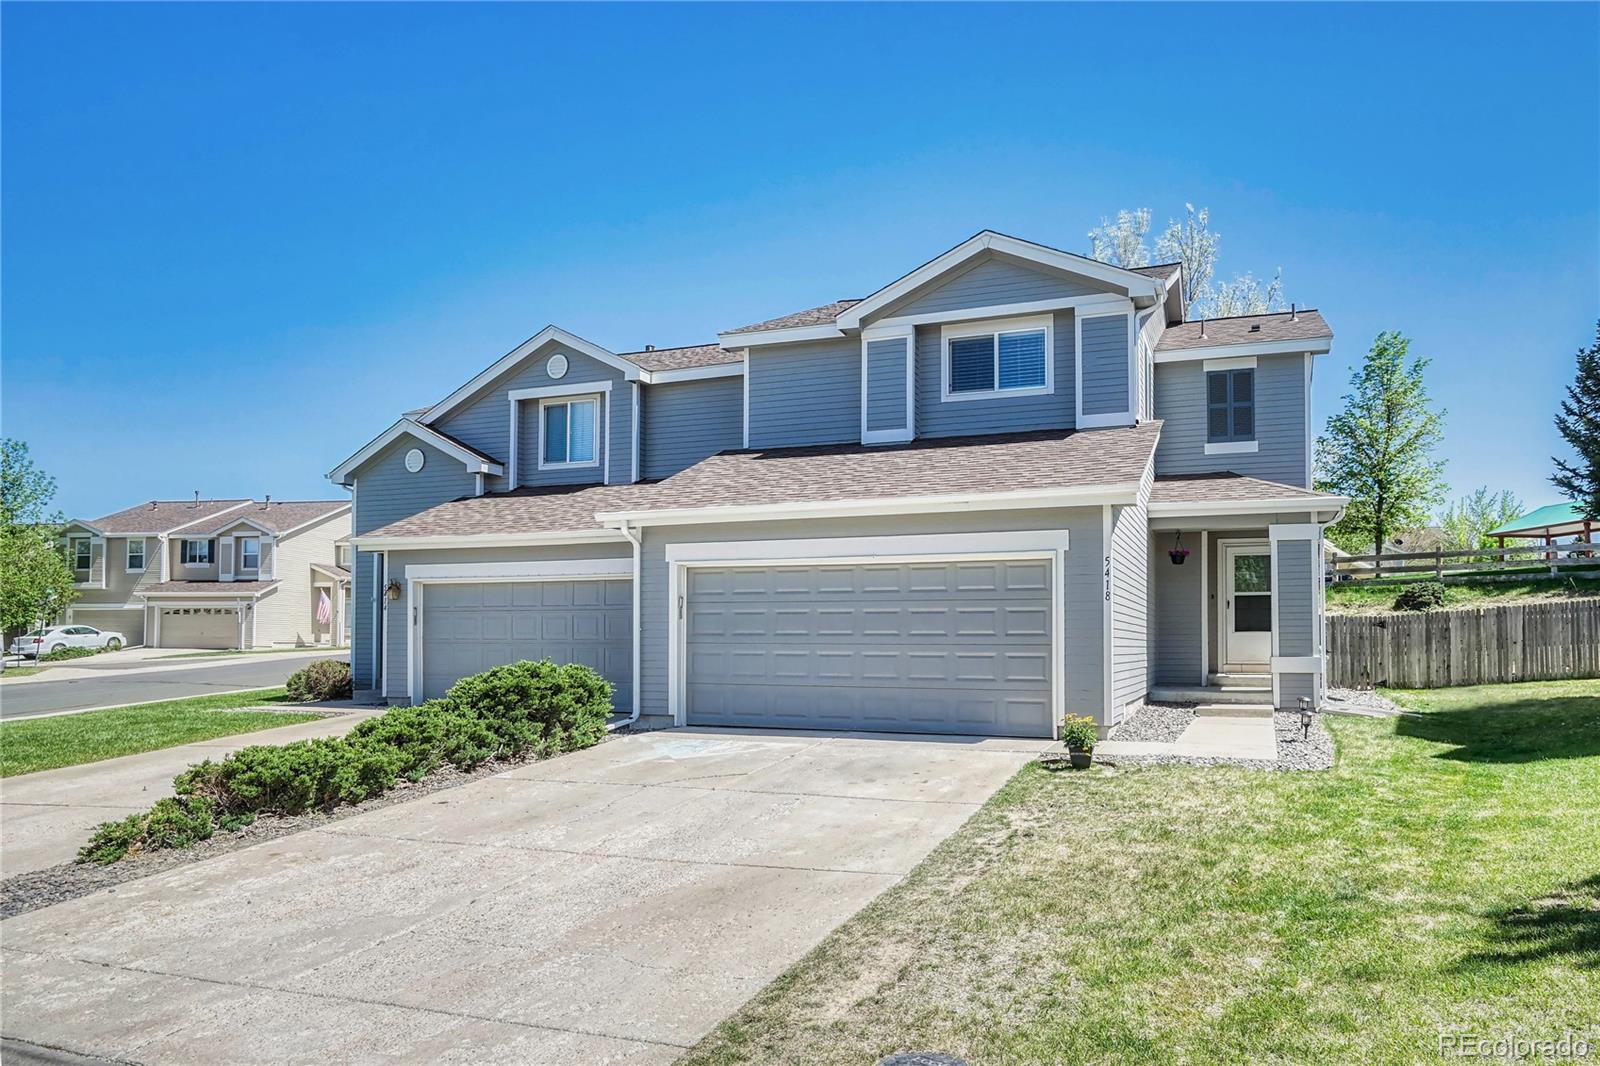 5418 S Quatar Court, Aurora, CO 80015 - Aurora, CO real estate listing